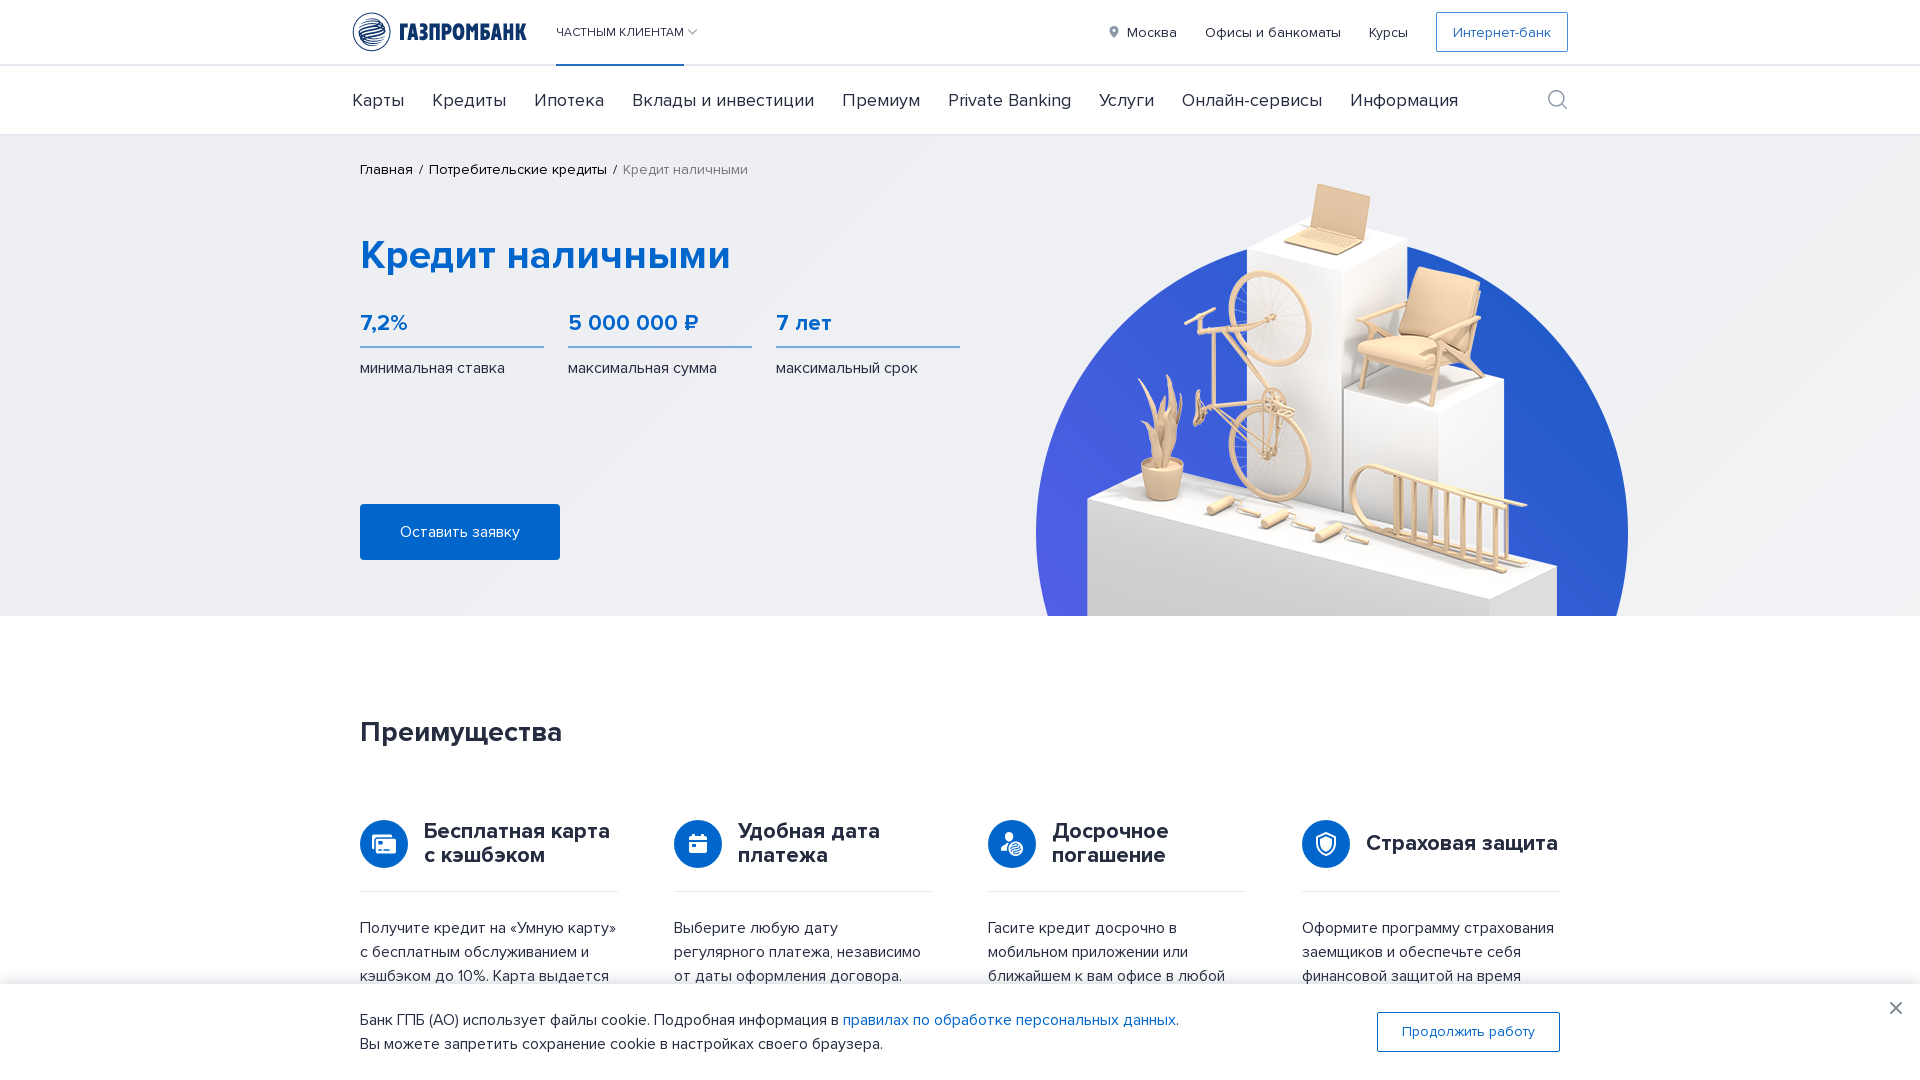 Газпромбанк [CPL] RU website